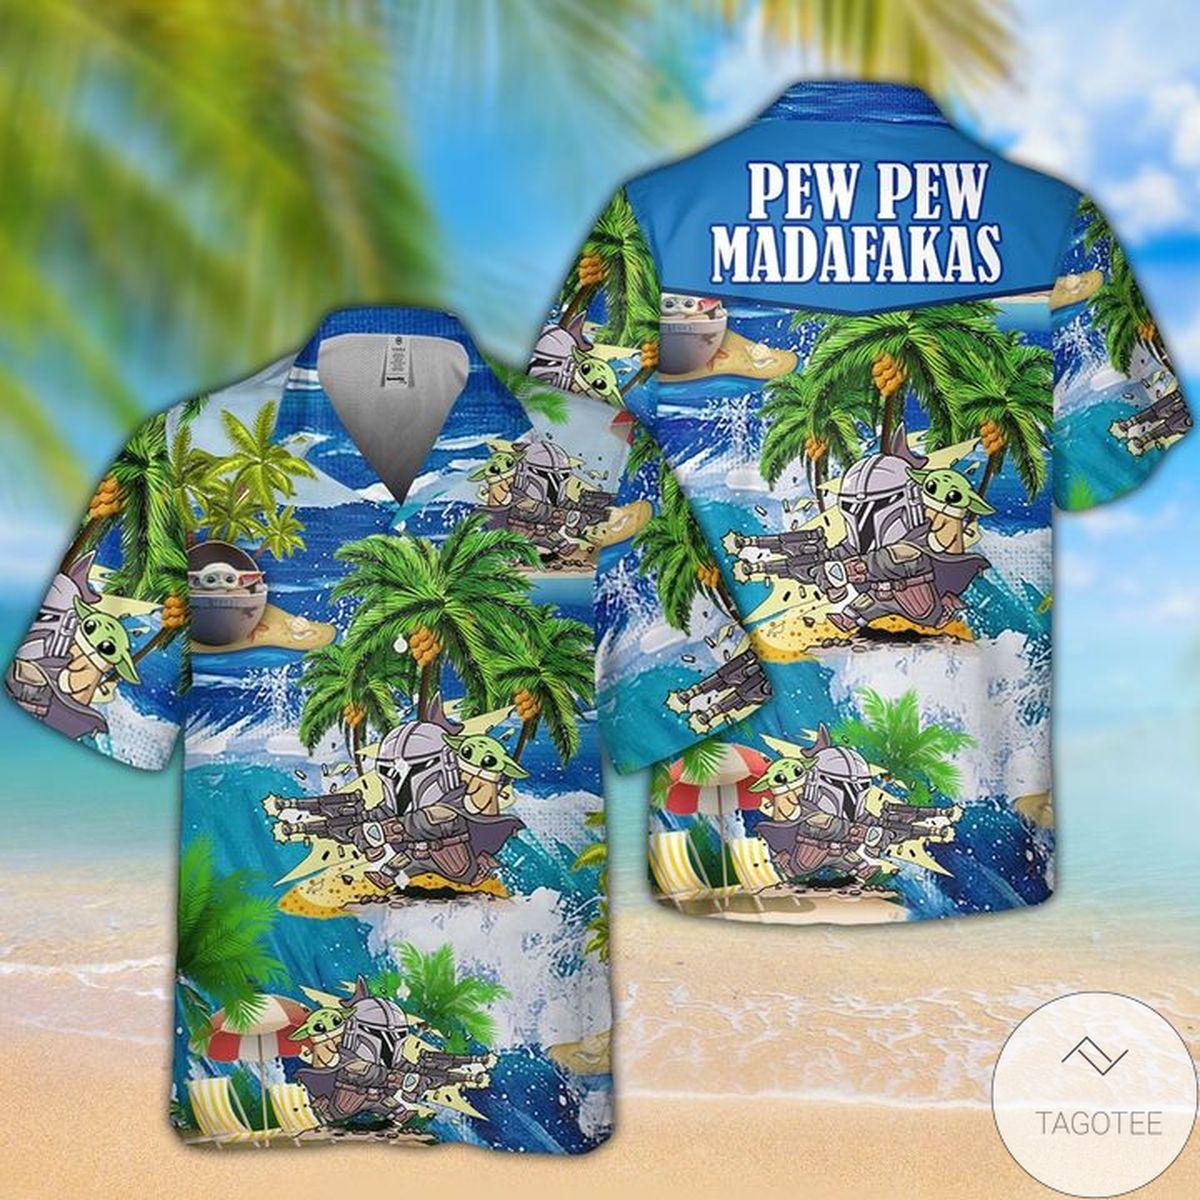 Amazing Pew Pew Madafakas Hawaii Shirt